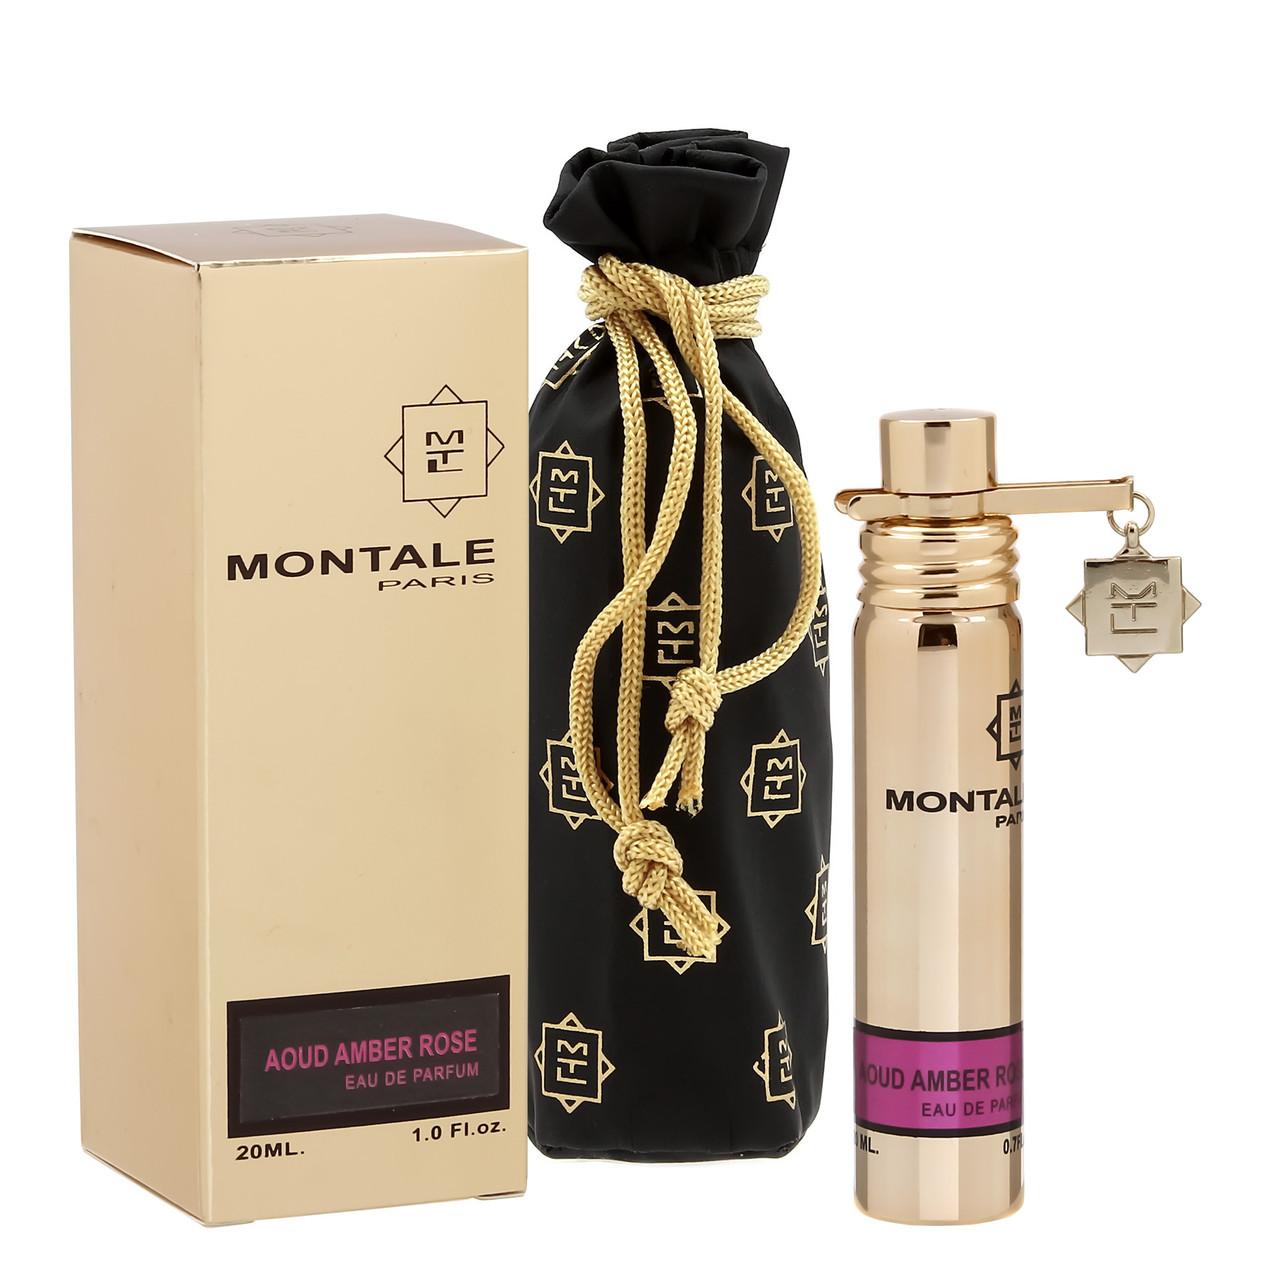 Парфюмированная вода с феромонами унисекс Montale Aoud Amber Rose,20 мл